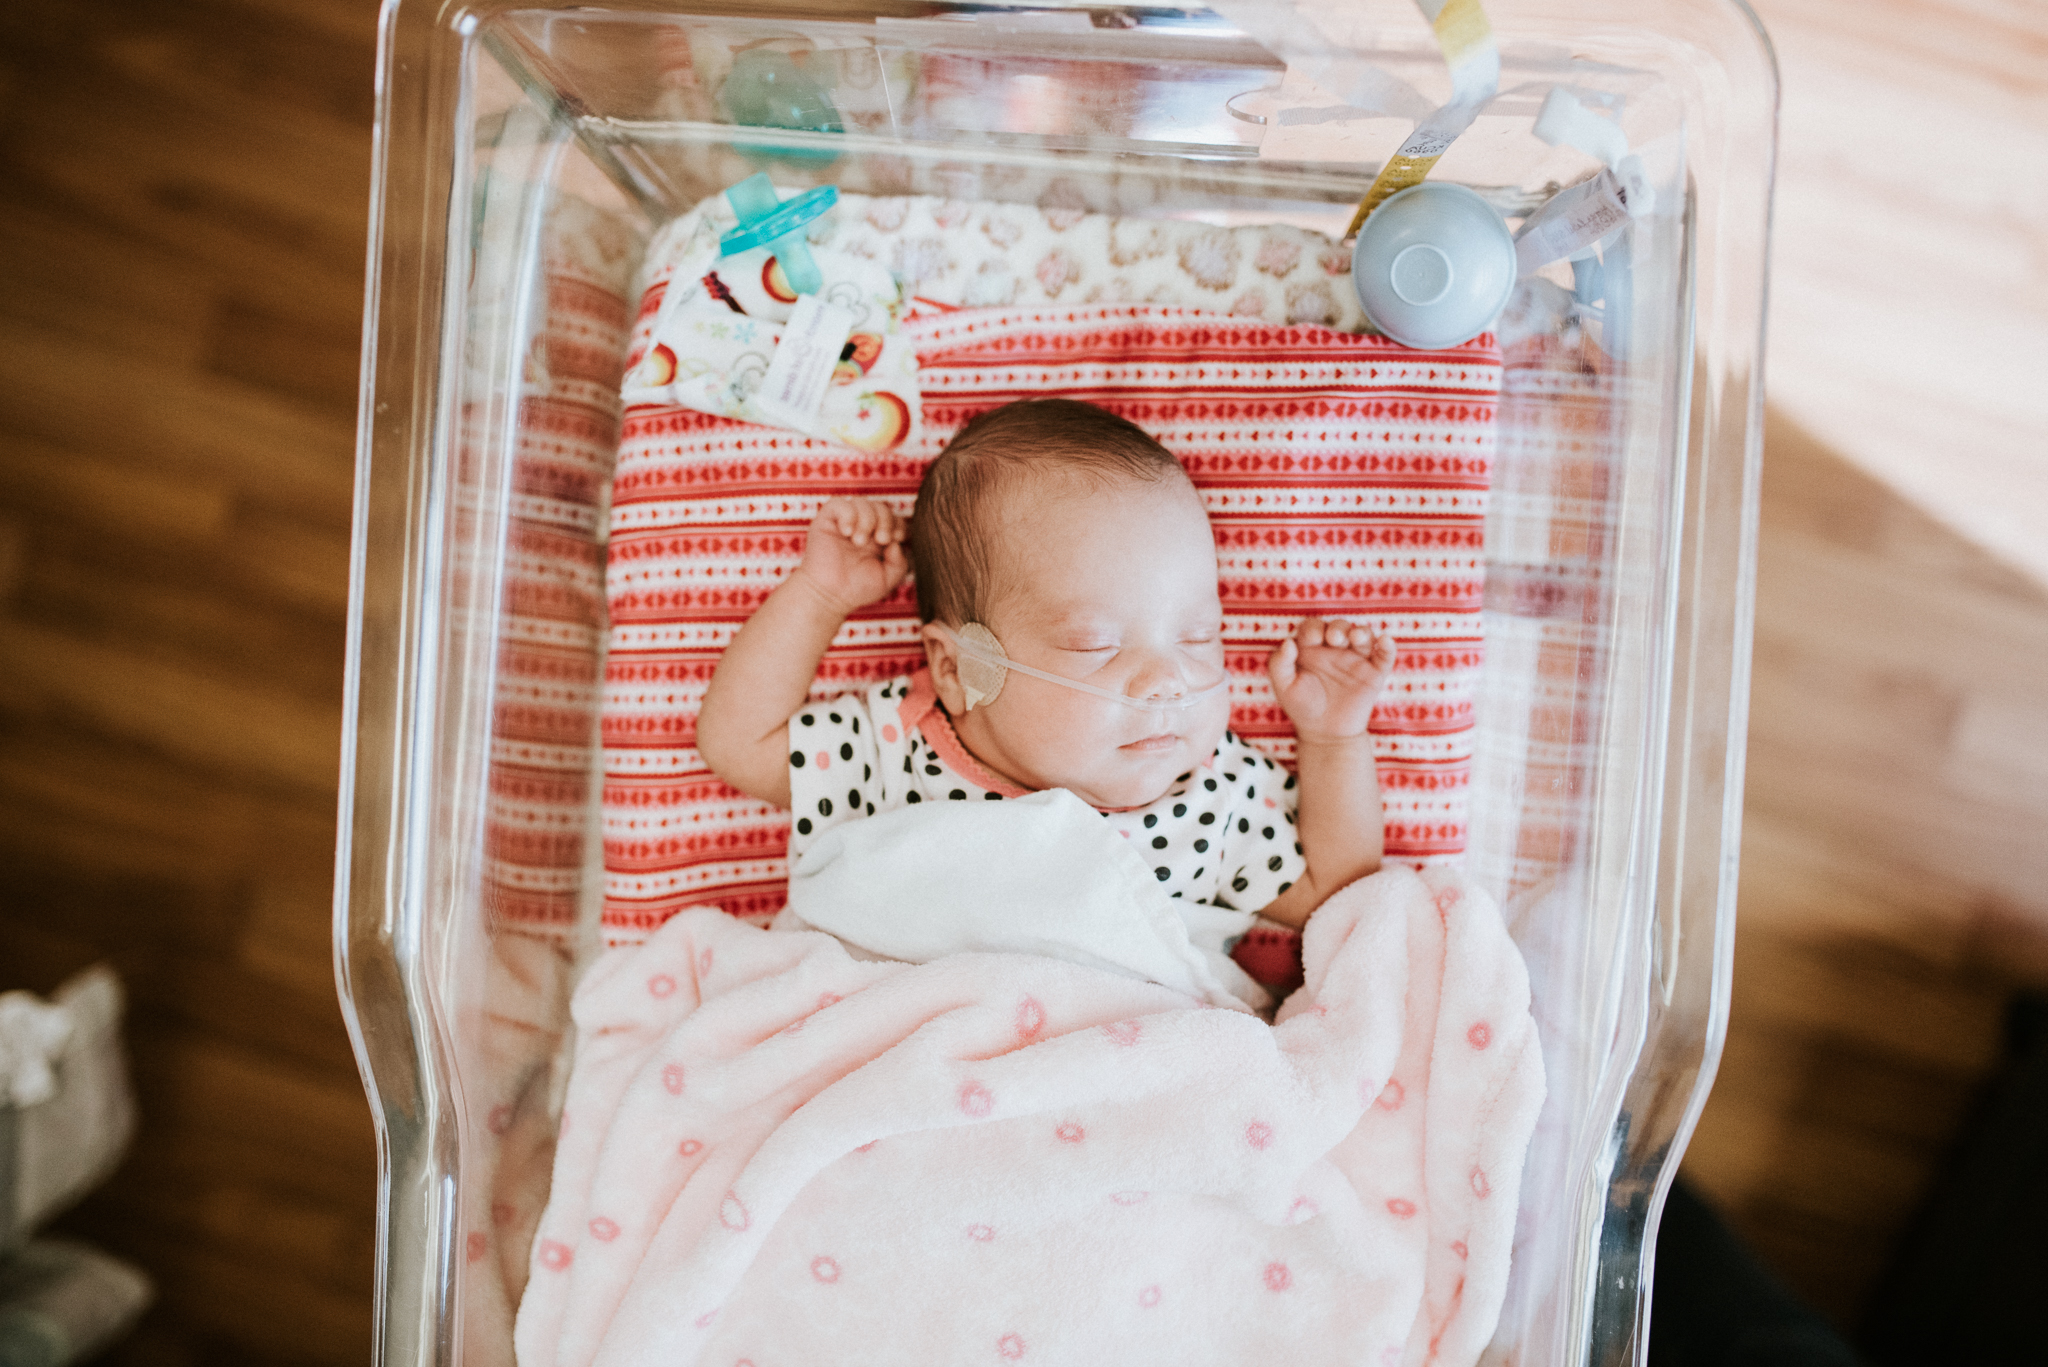 Round Rock Newborn Photographer_Emily Ingalls Photography_ Pflugerville Newborn Photographer_Family Photographer_Round Rock Photographer_Austin Photographer_Pflugerville Photographer_Hutto Photographer-1.jpg